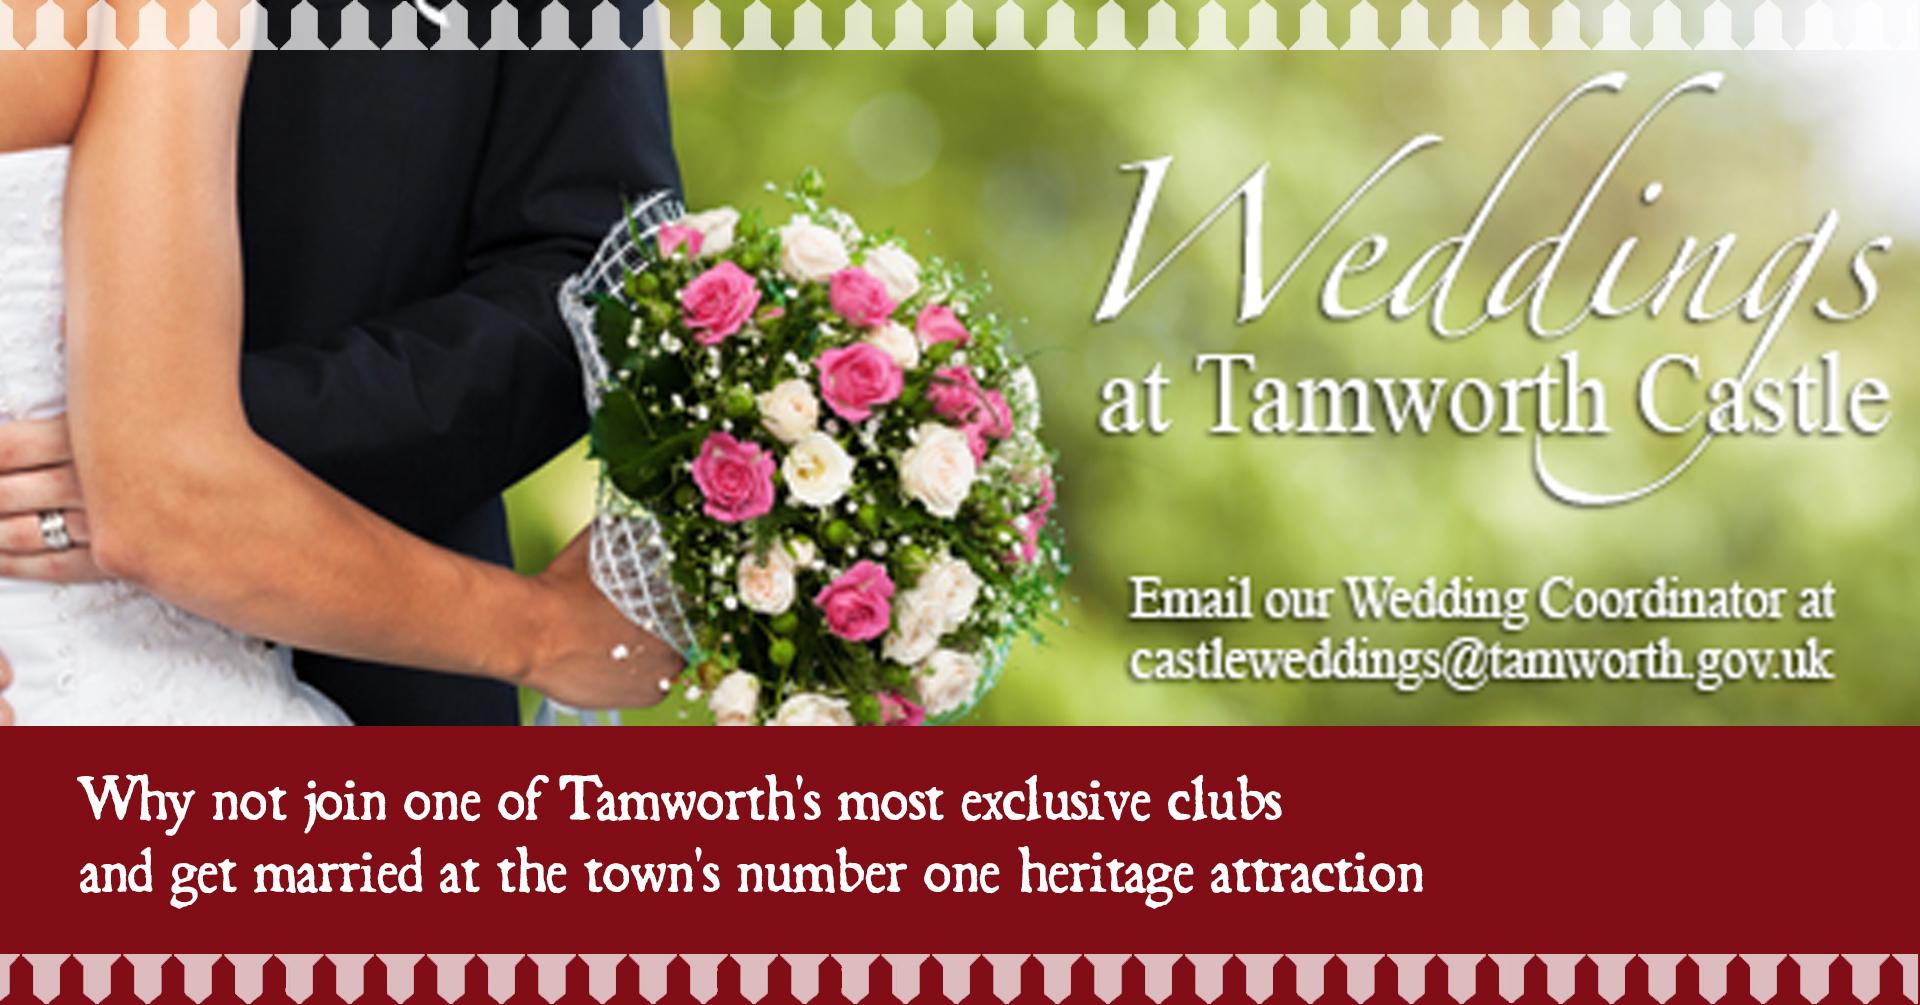 Weddings at Tamworth Castle